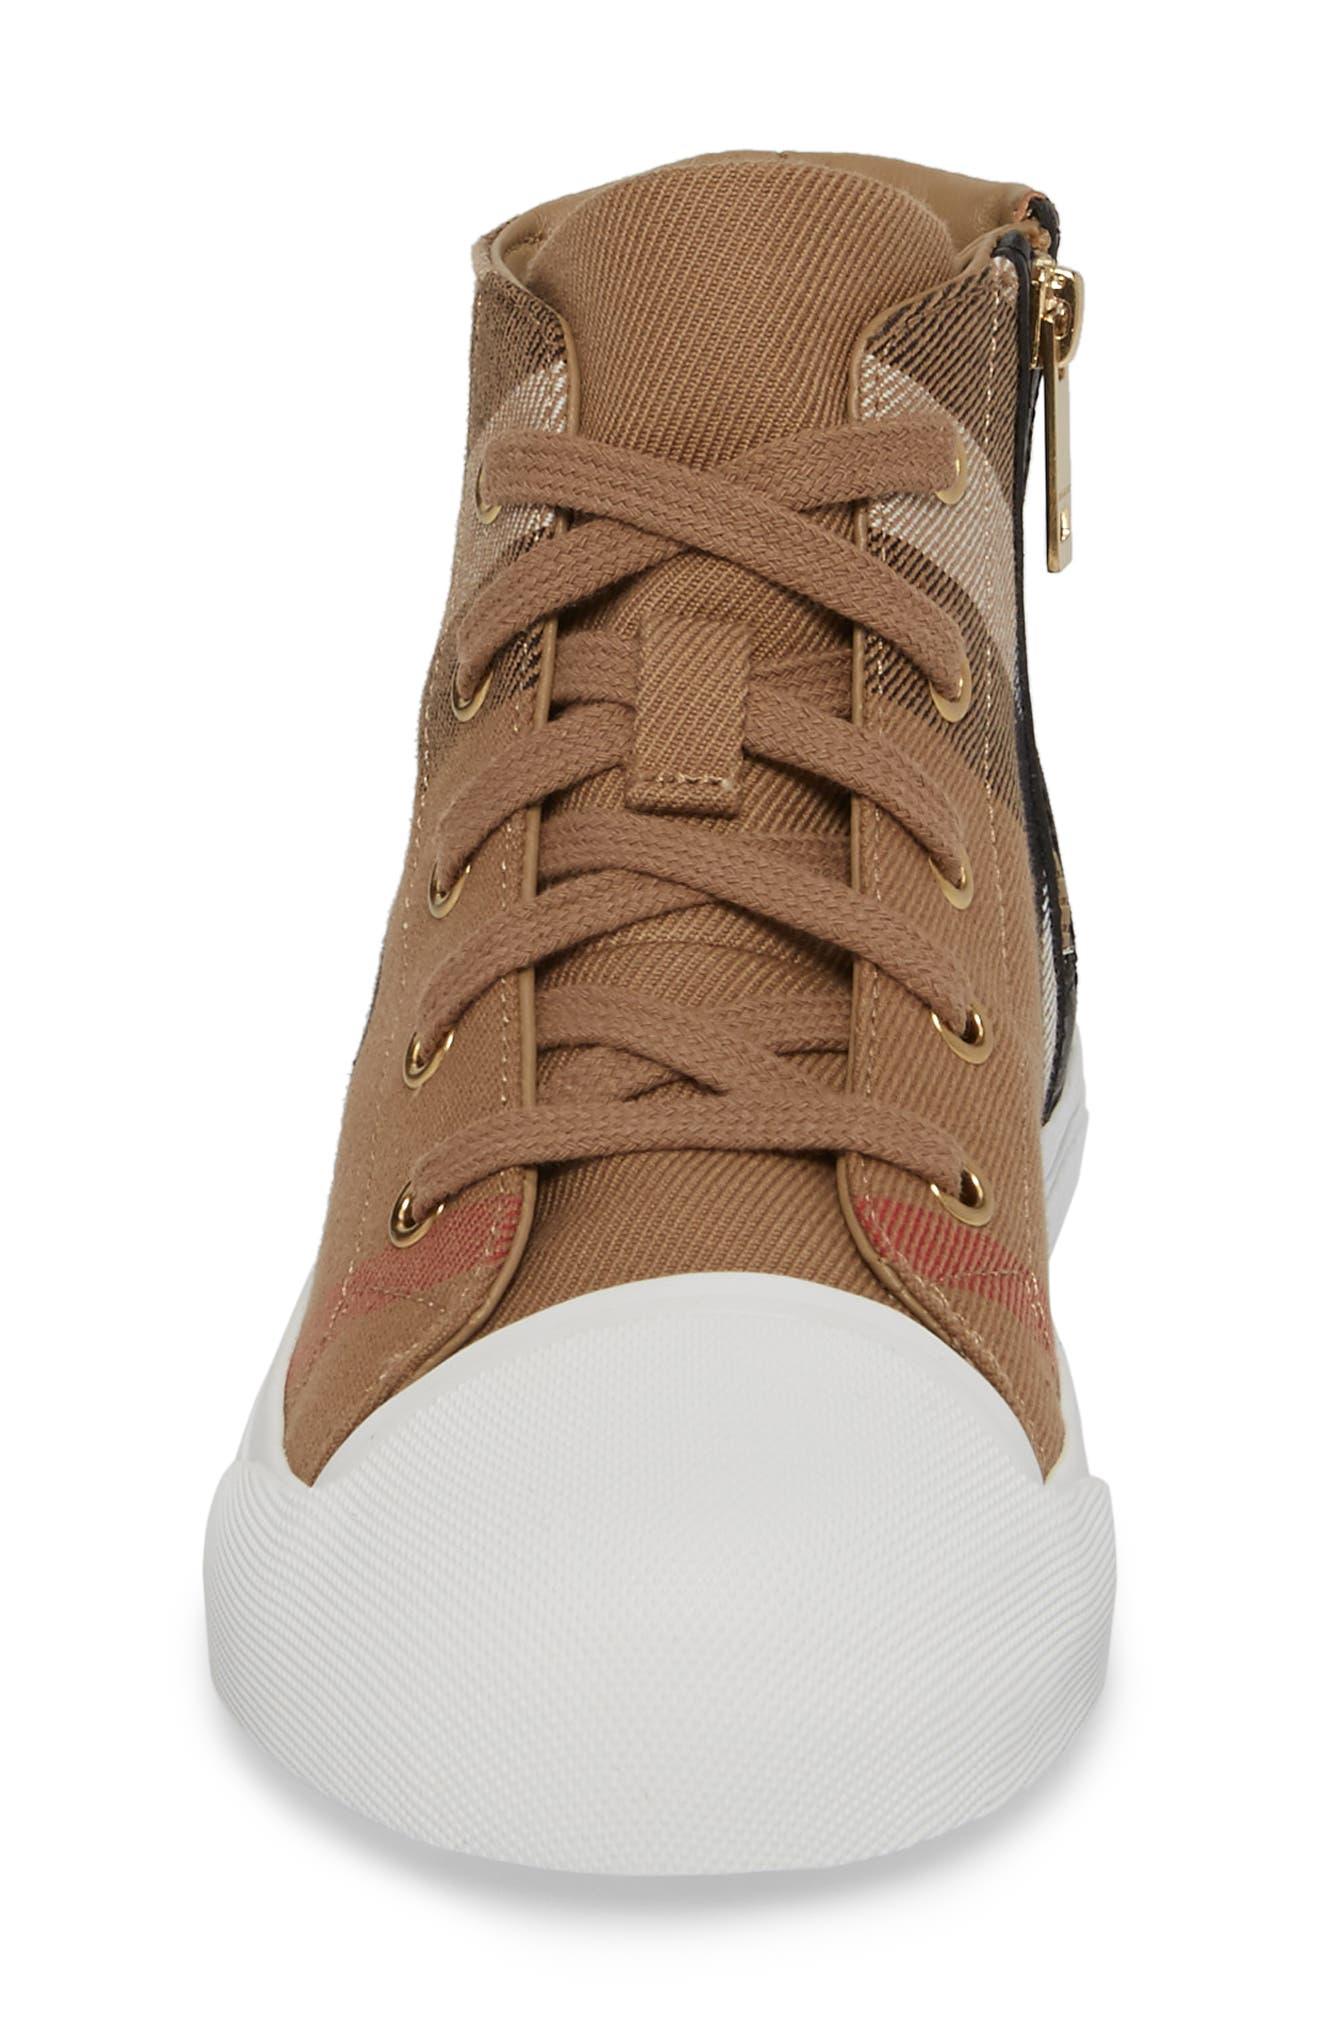 Belford High Top Sneaker,                             Alternate thumbnail 5, color,                             Classic/ Neon Green